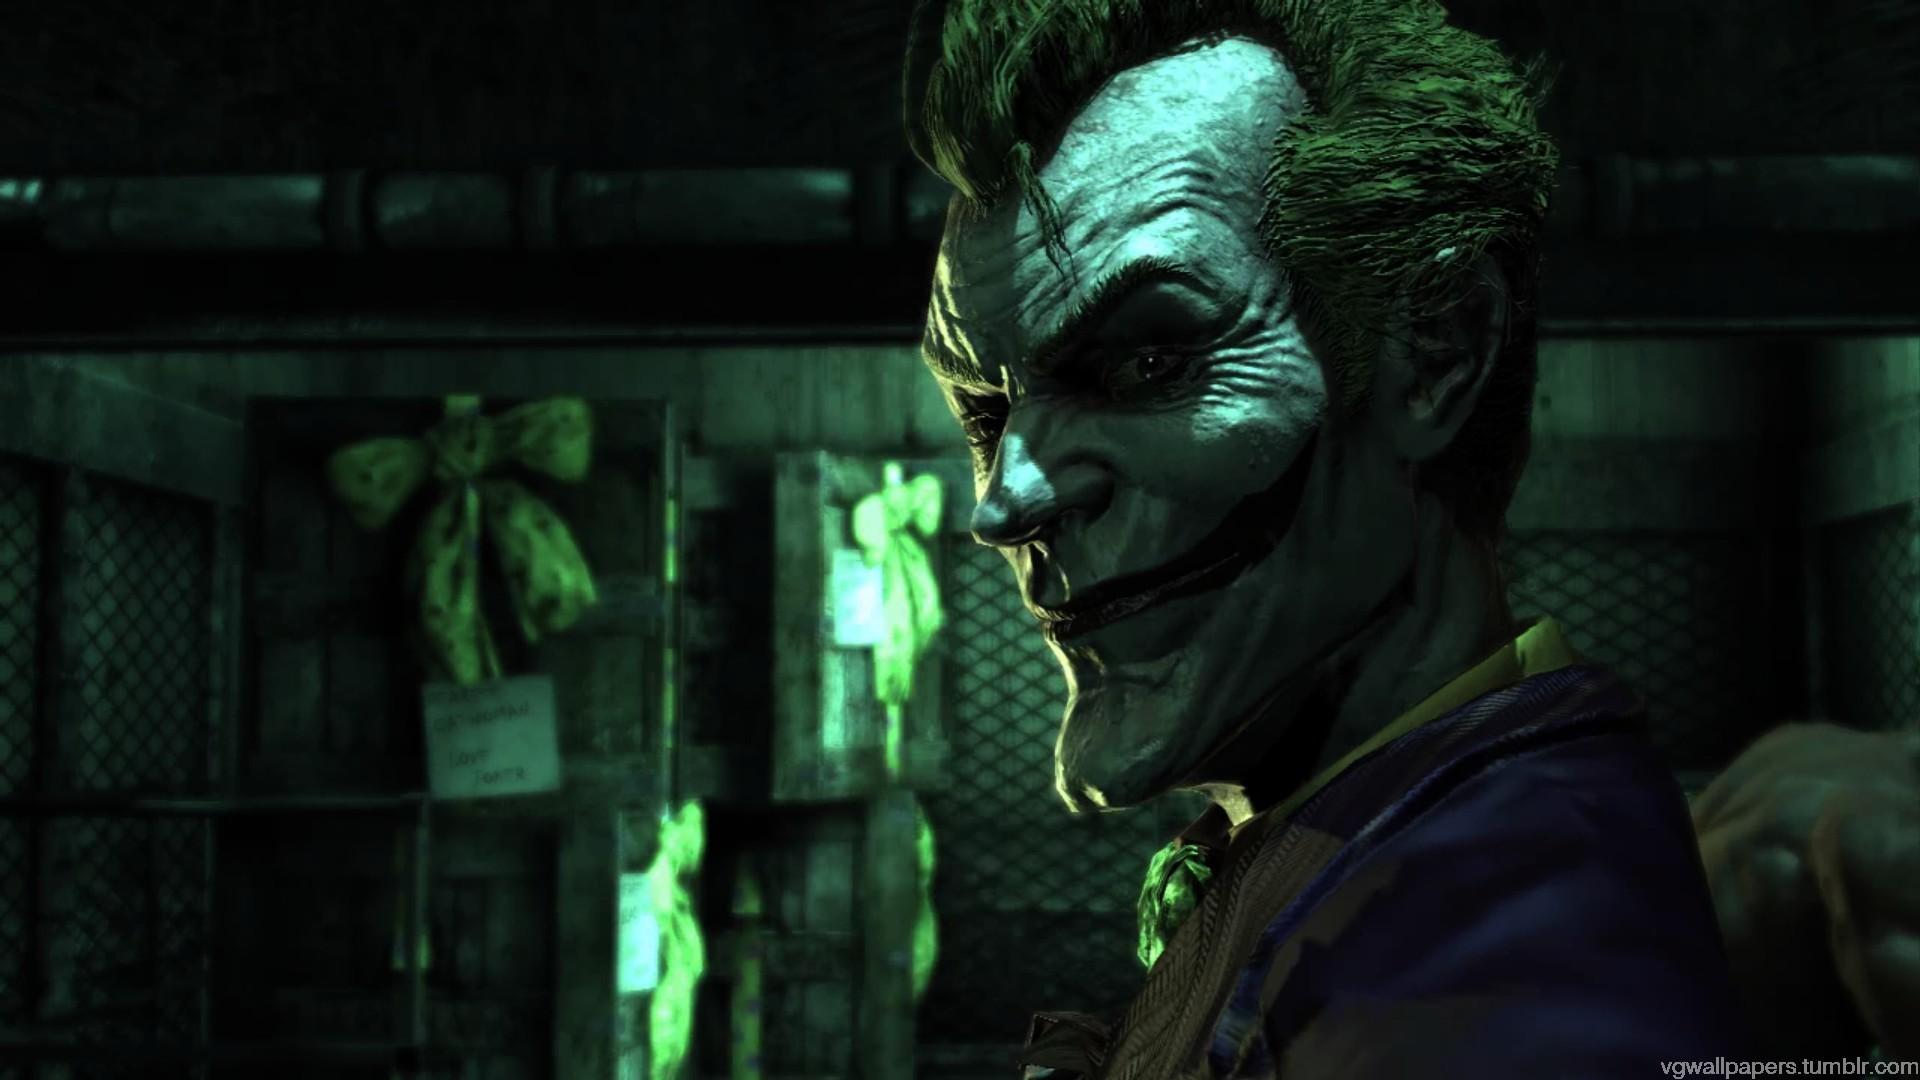 Joker Arkham Asylum Wallpaper Dc el wallpape 1920x1080